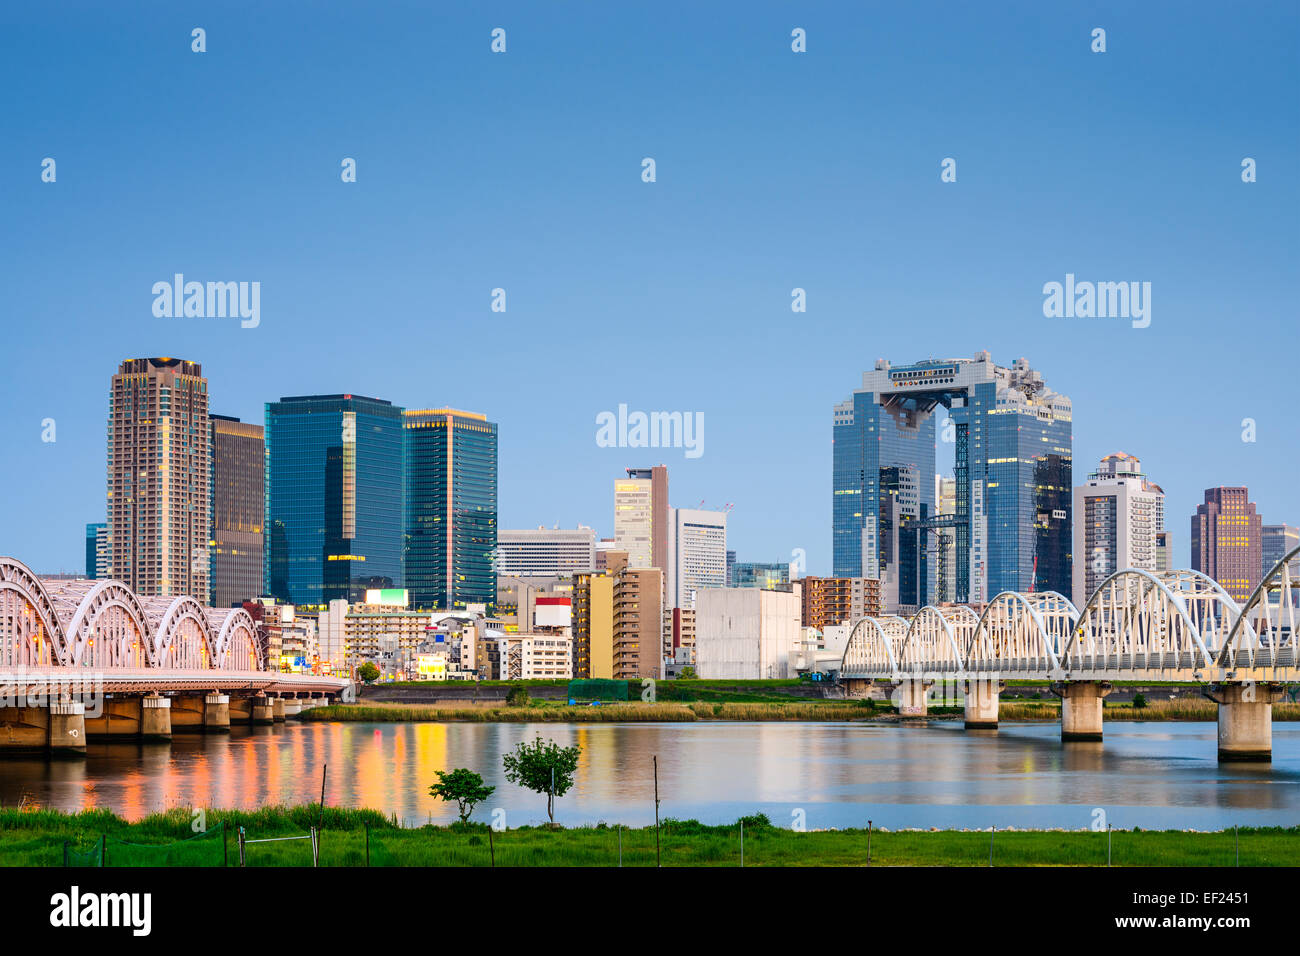 Osaka, Japan skyline at Umeda from across the Yodogawa River. - Stock Image